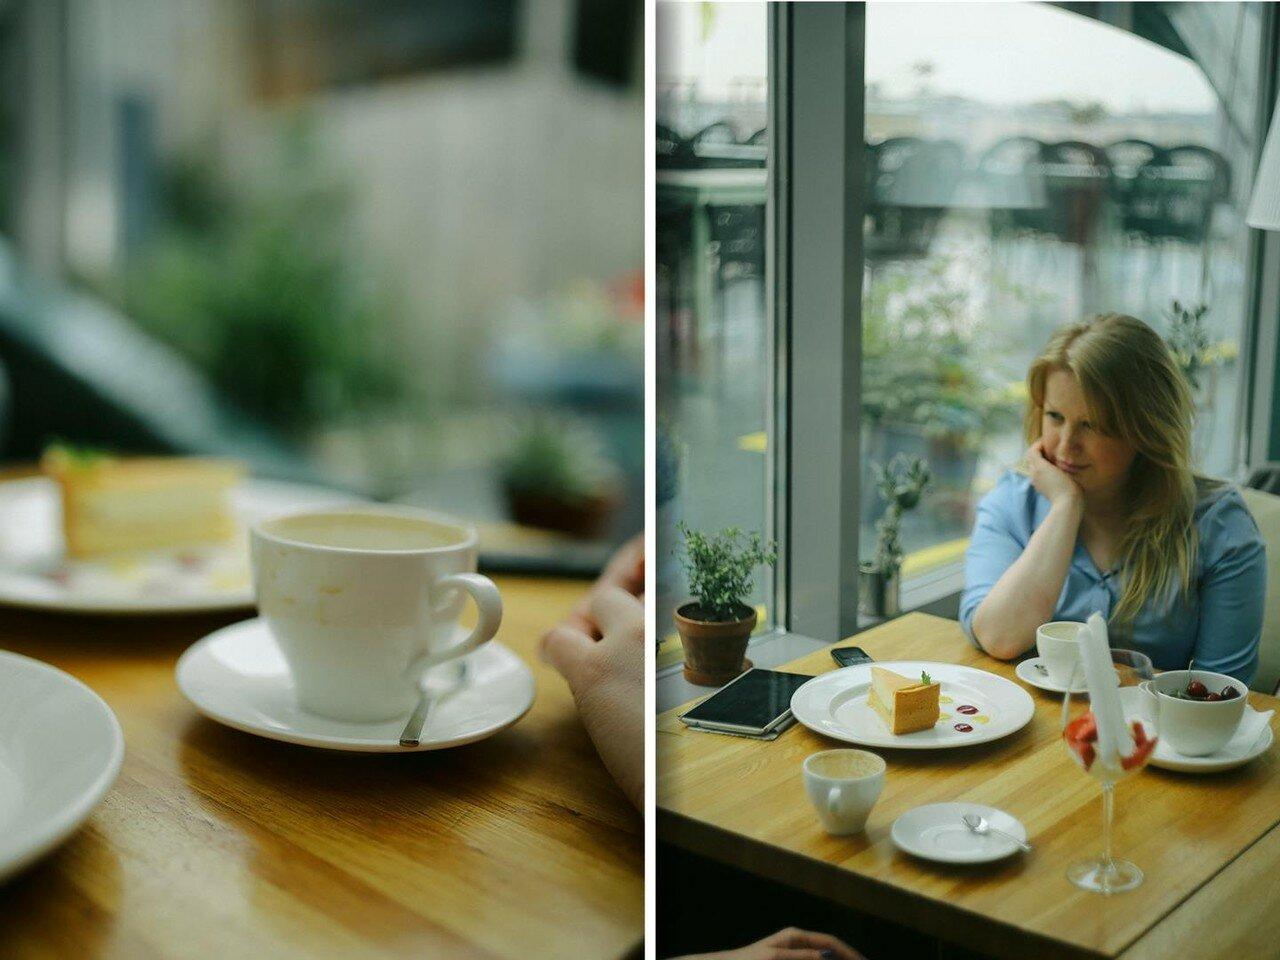 natali_leskova_girlswhoinspire_38.jpg